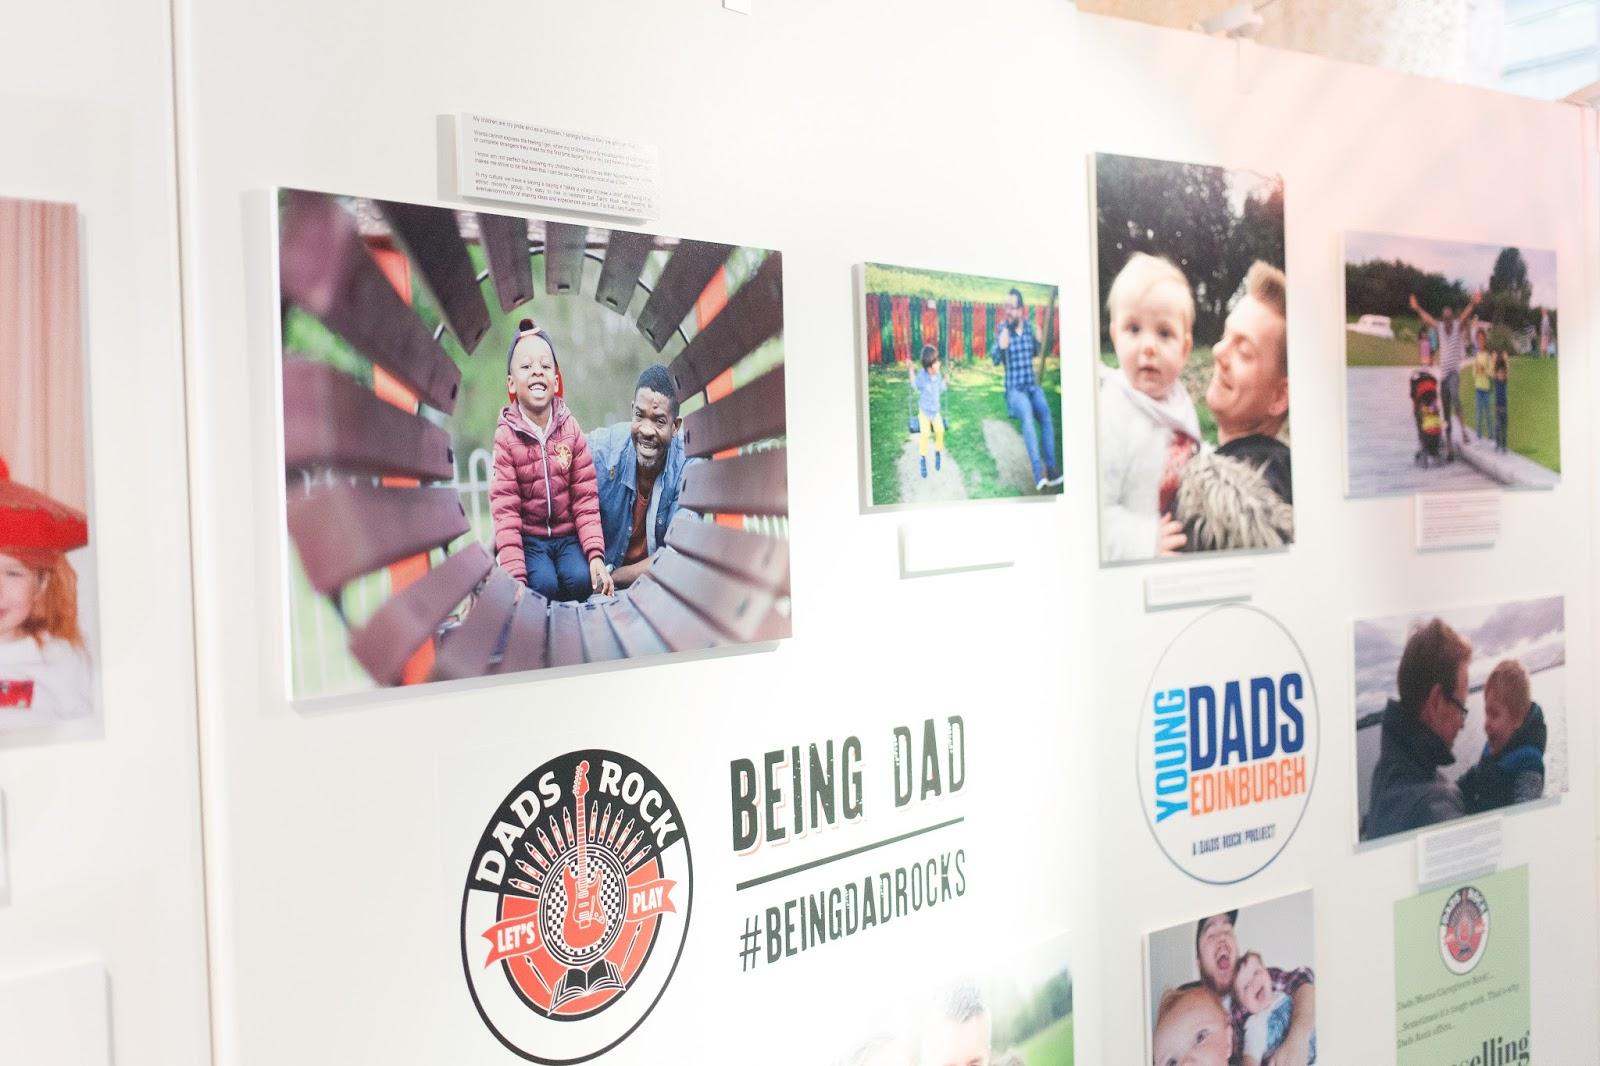 Being_Dad-16.jpg